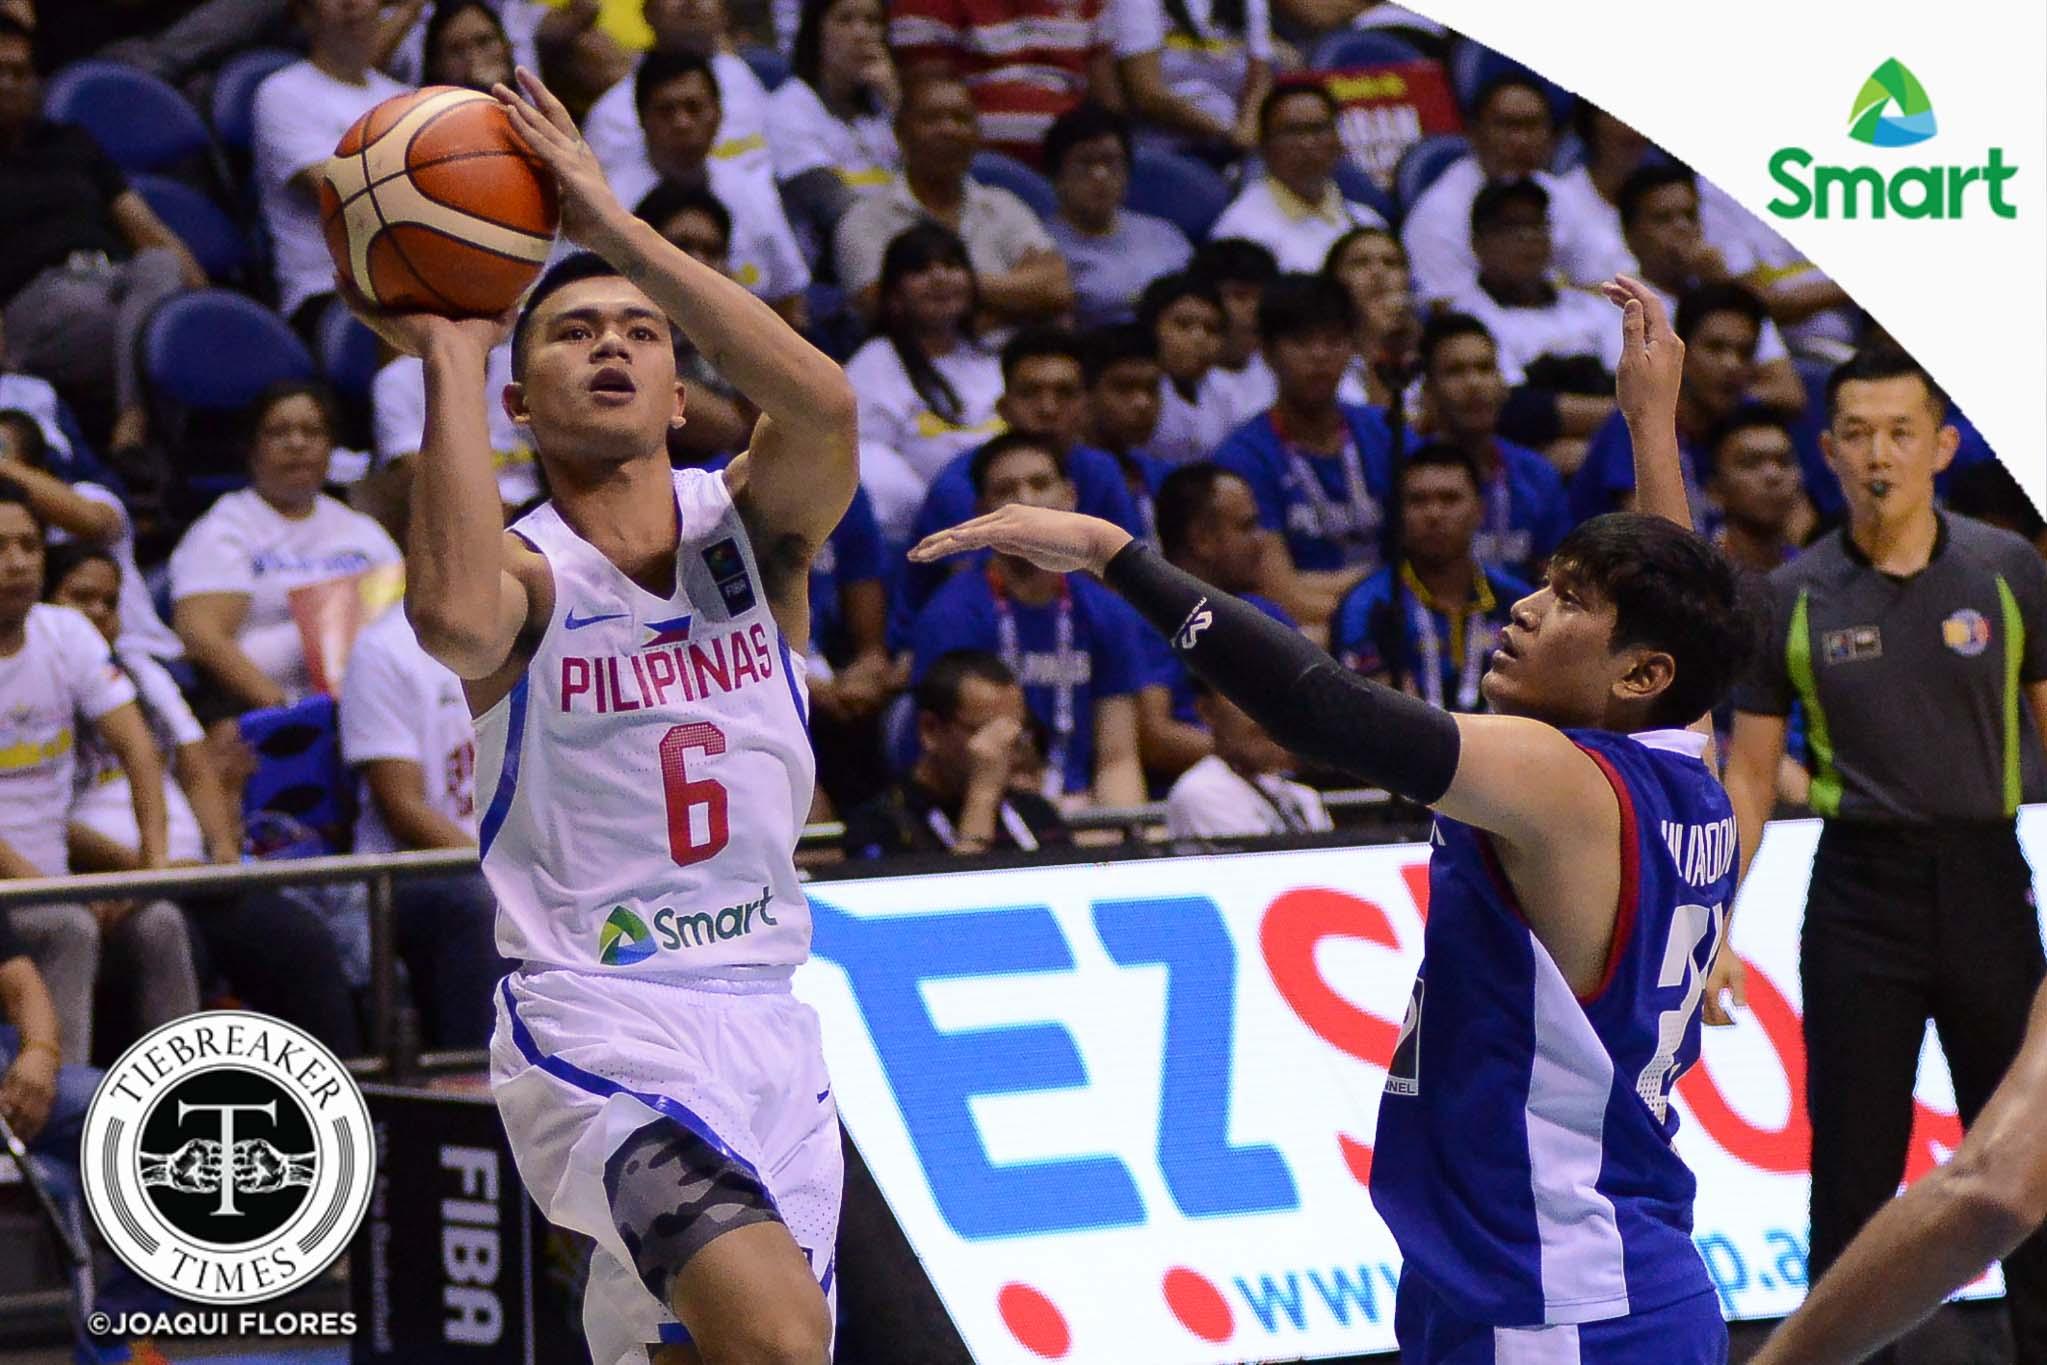 Tiebreaker Times Jalalon was the MVP of the tournament, says Chot 2017 SEABA Championship 2017 SEABA Seniors Basketball Gilas Pilipinas News  Terrence Romeo Jio Jalalon Chot Reyes